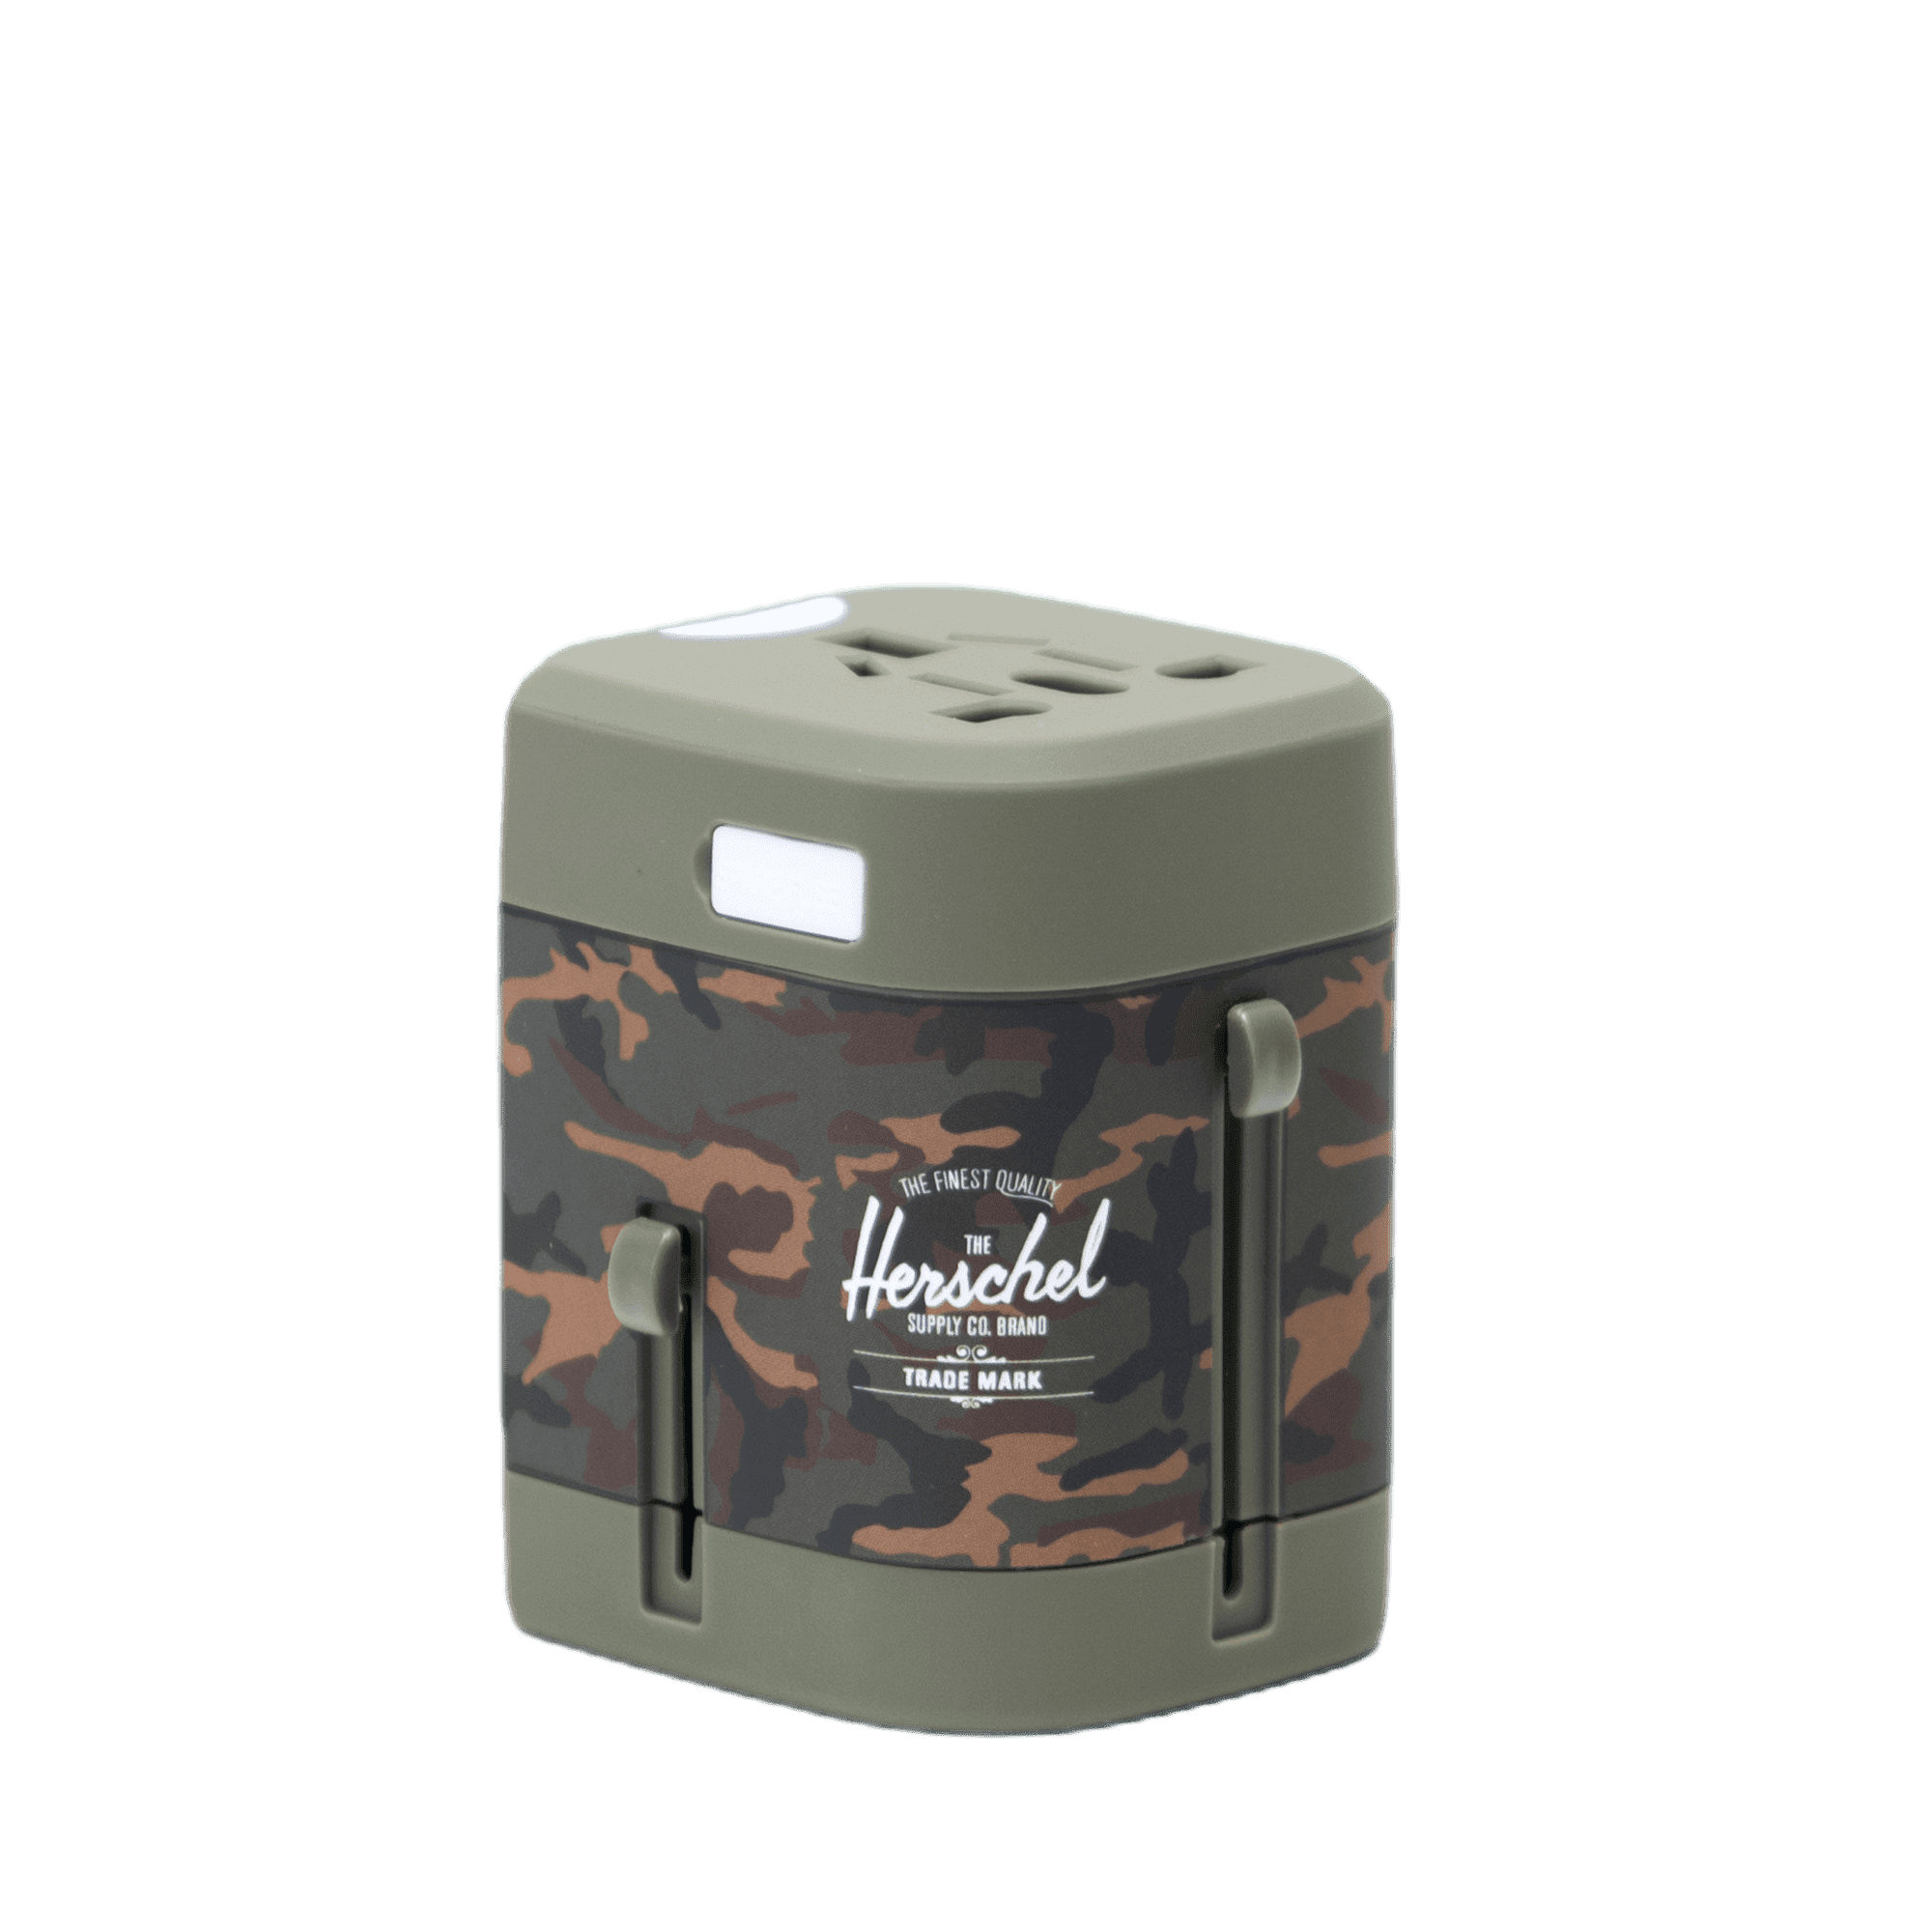 Travel adapter woodland camo